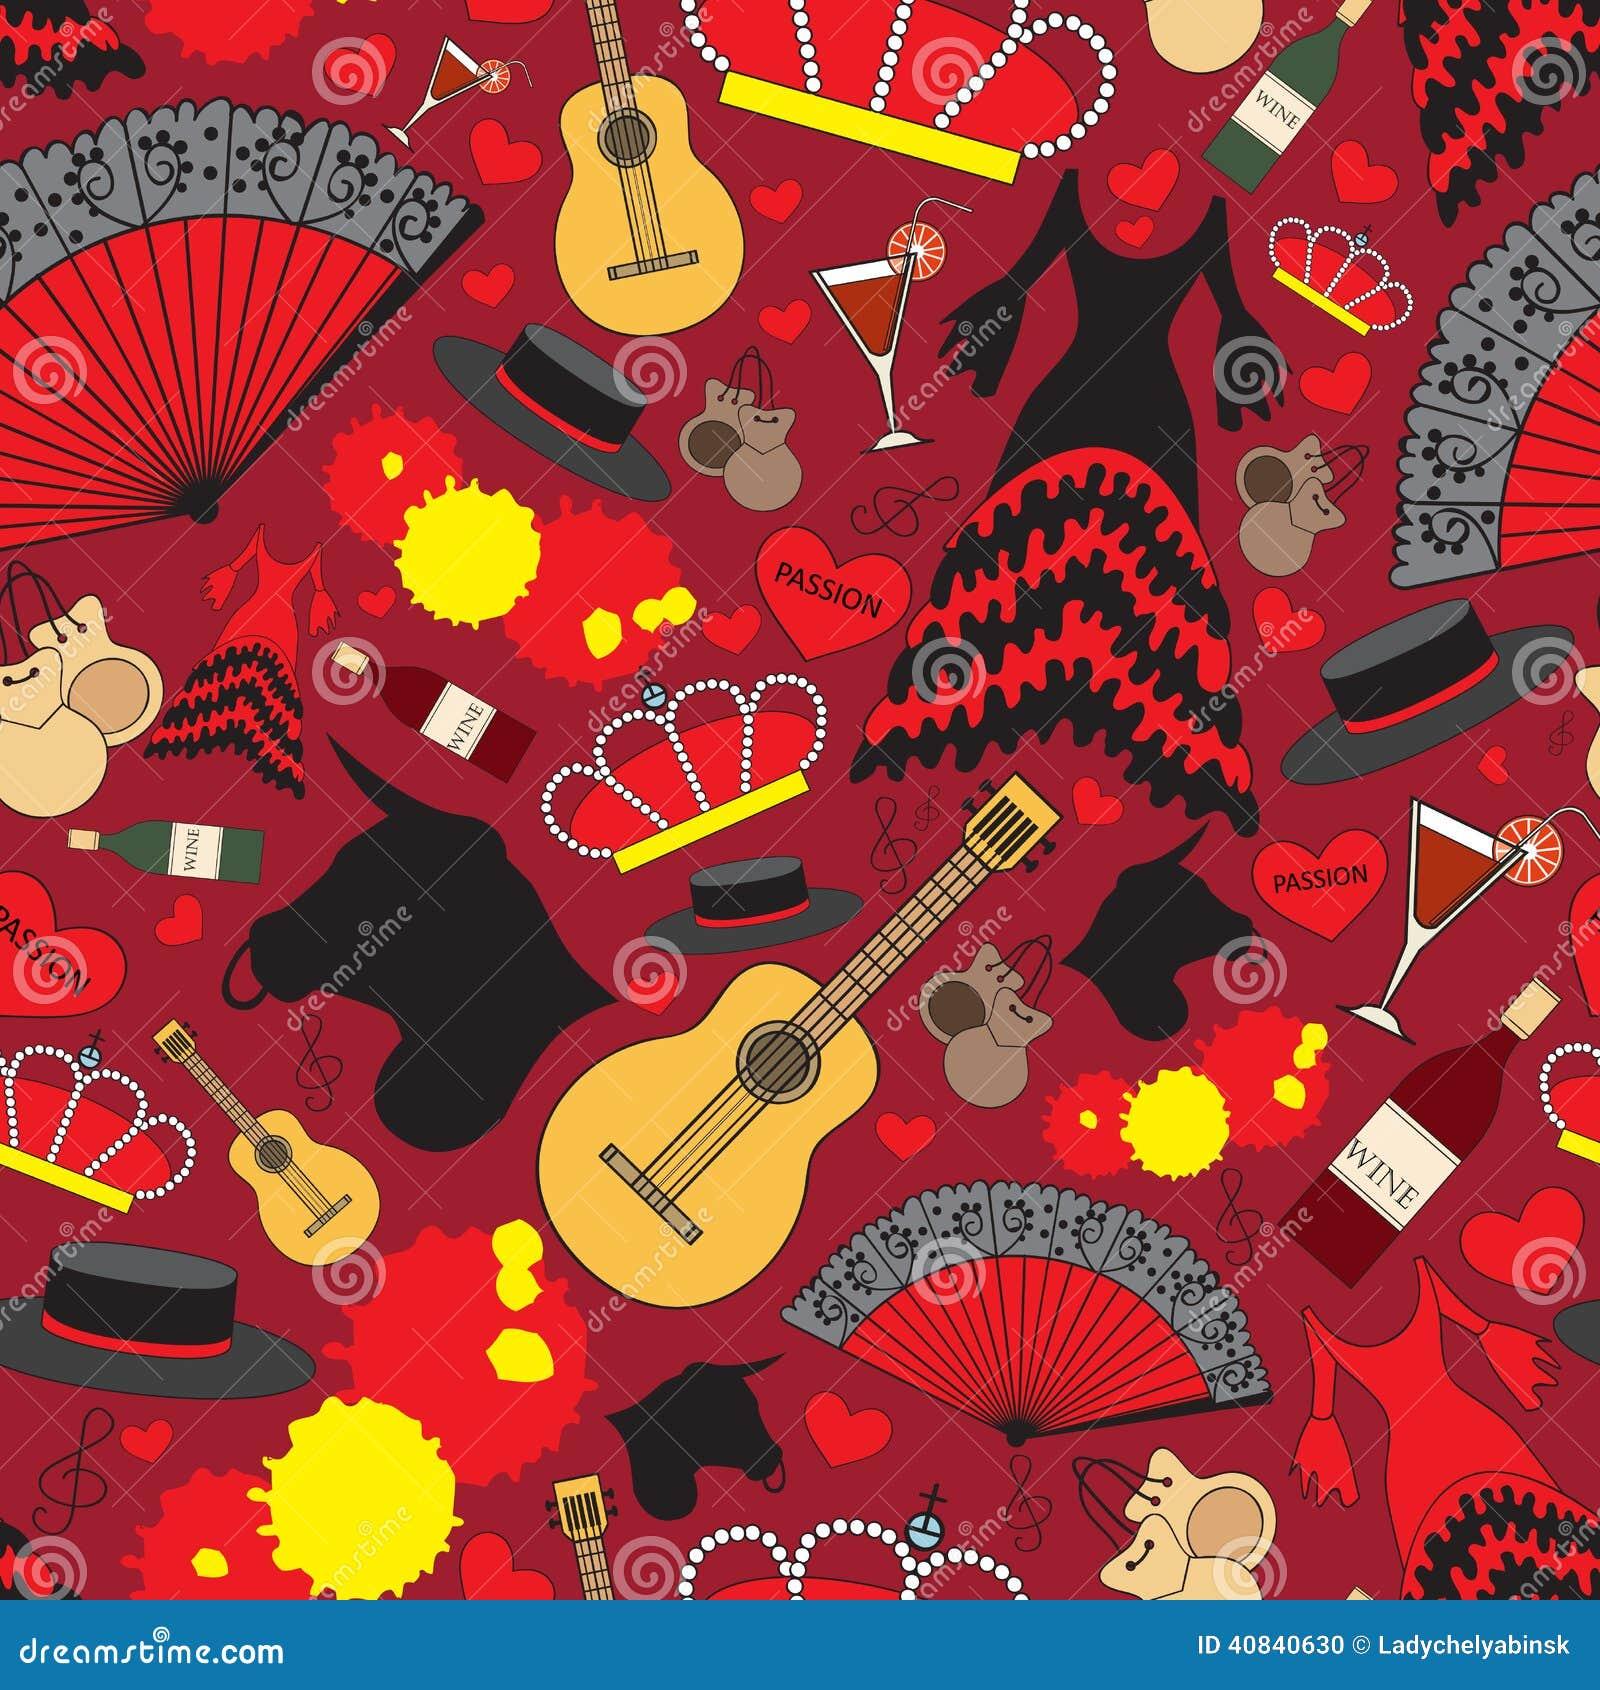 77 Best Designs images  Backgrounds Background images